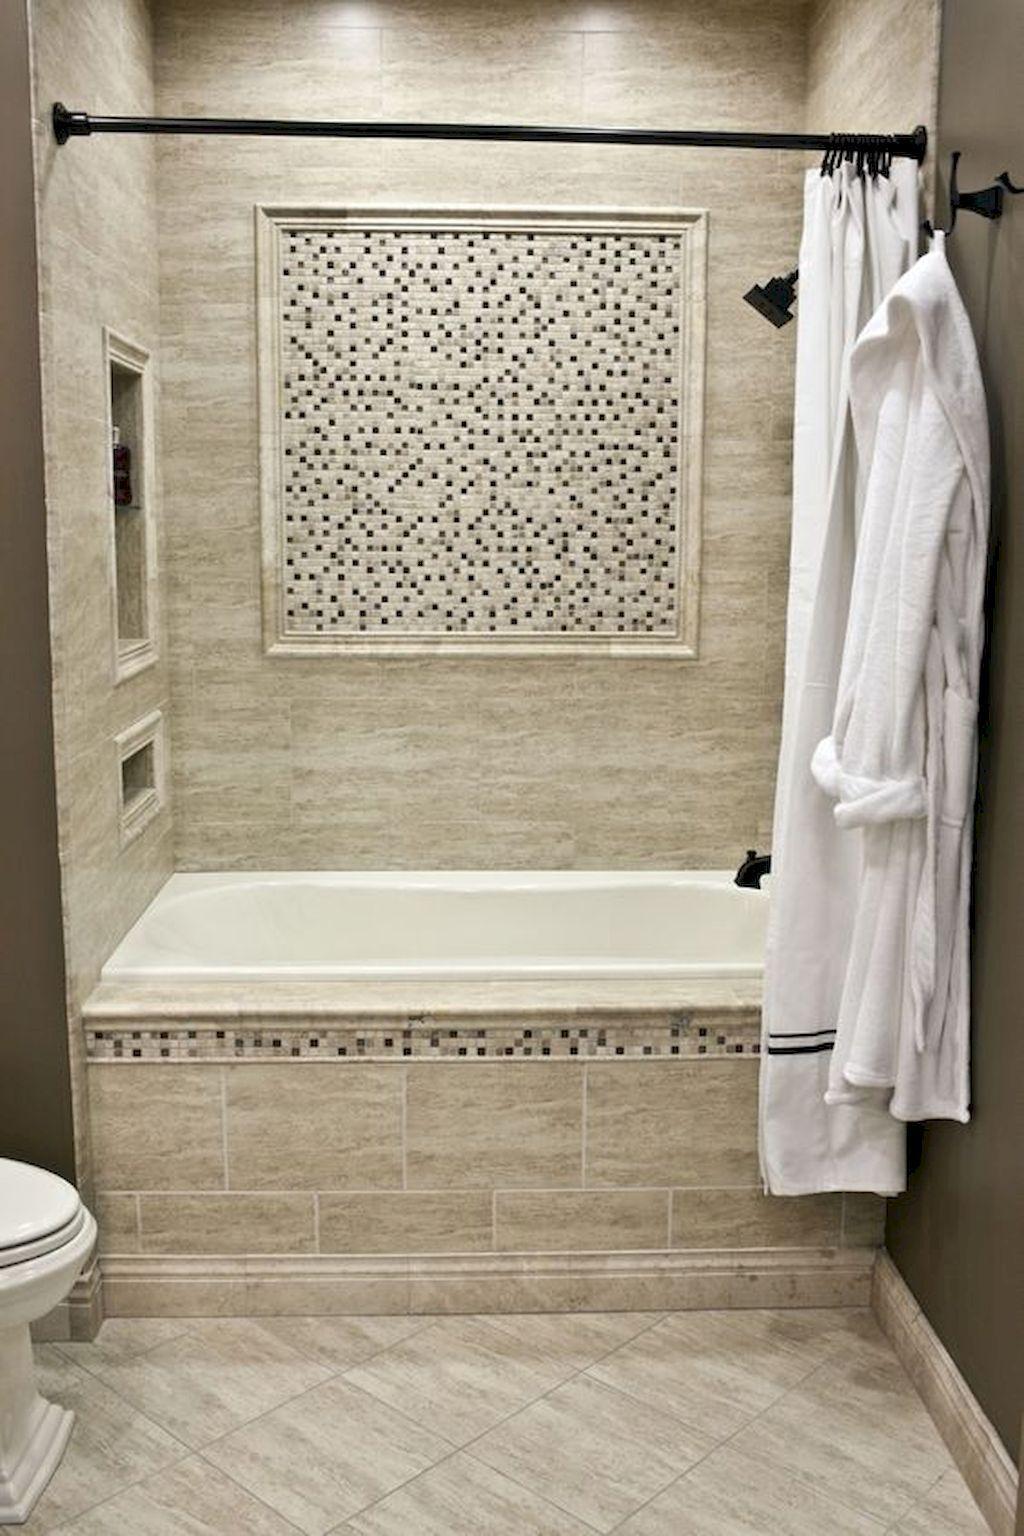 50 Beautiful Bathroom Shower Tile Ideas 1 Bathroomshowermakeovers Small Bathroom Tiles Bathroom Tub Shower Bathroom Remodel Shower